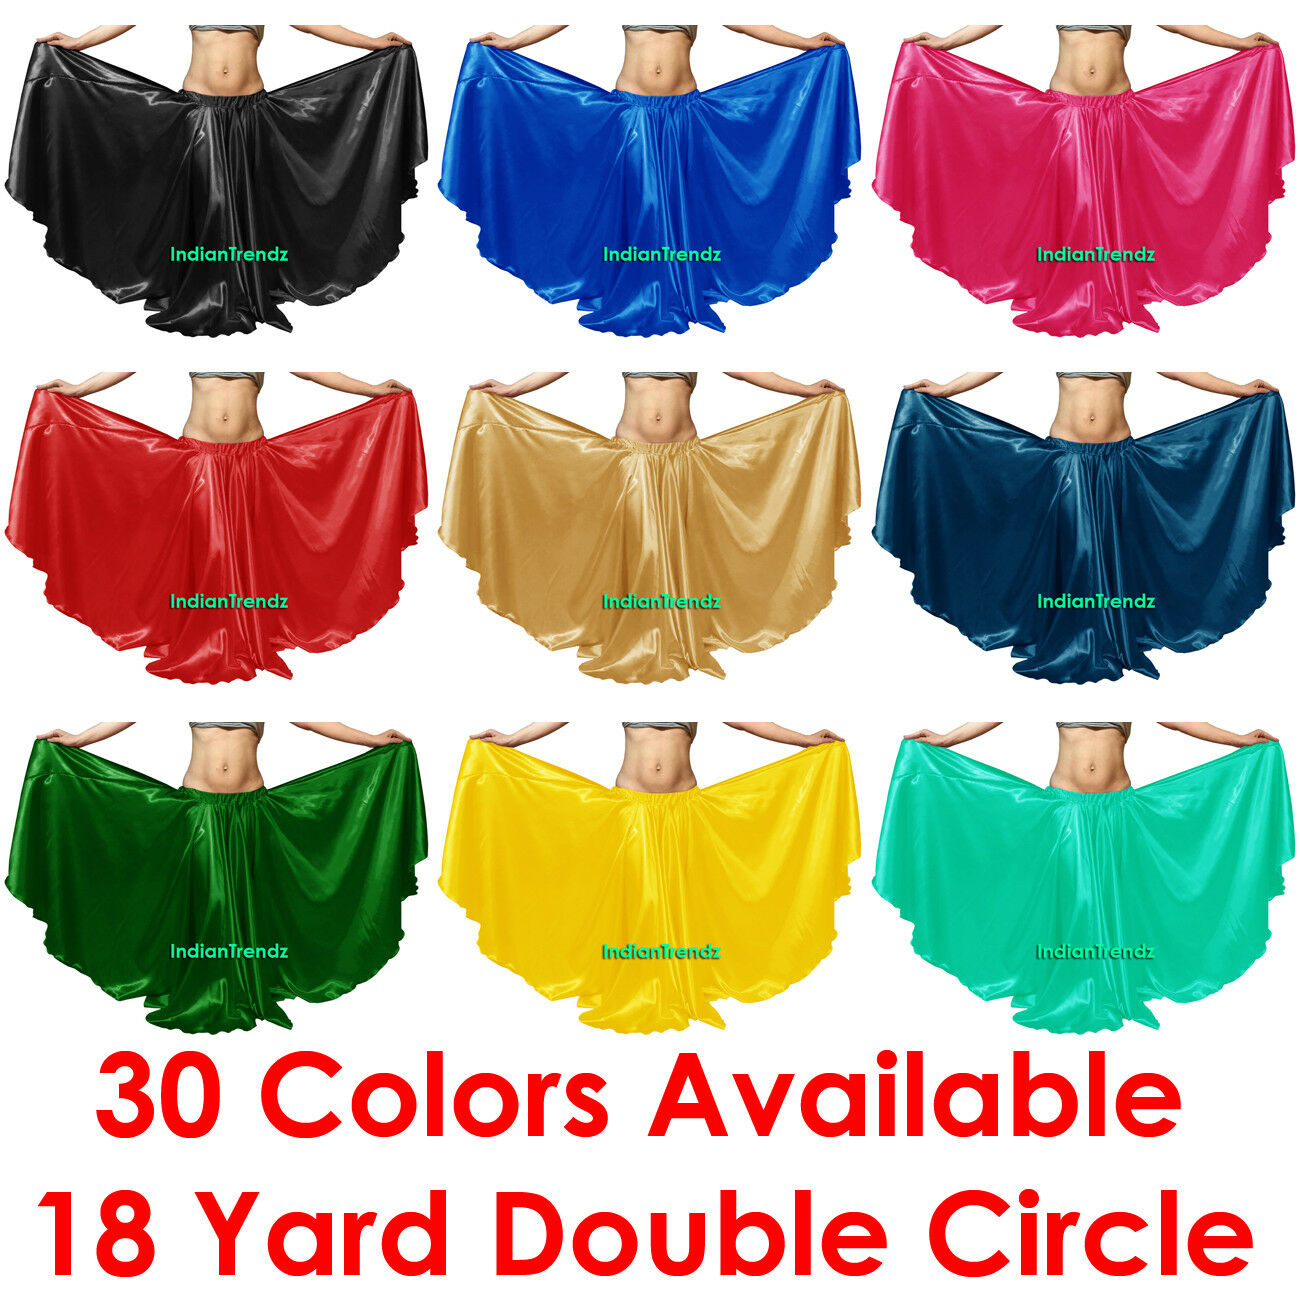 Satin 16 Yard Double Circle Skirt Belly Dance Gypsy Tribal Flamenco Boho Jupe